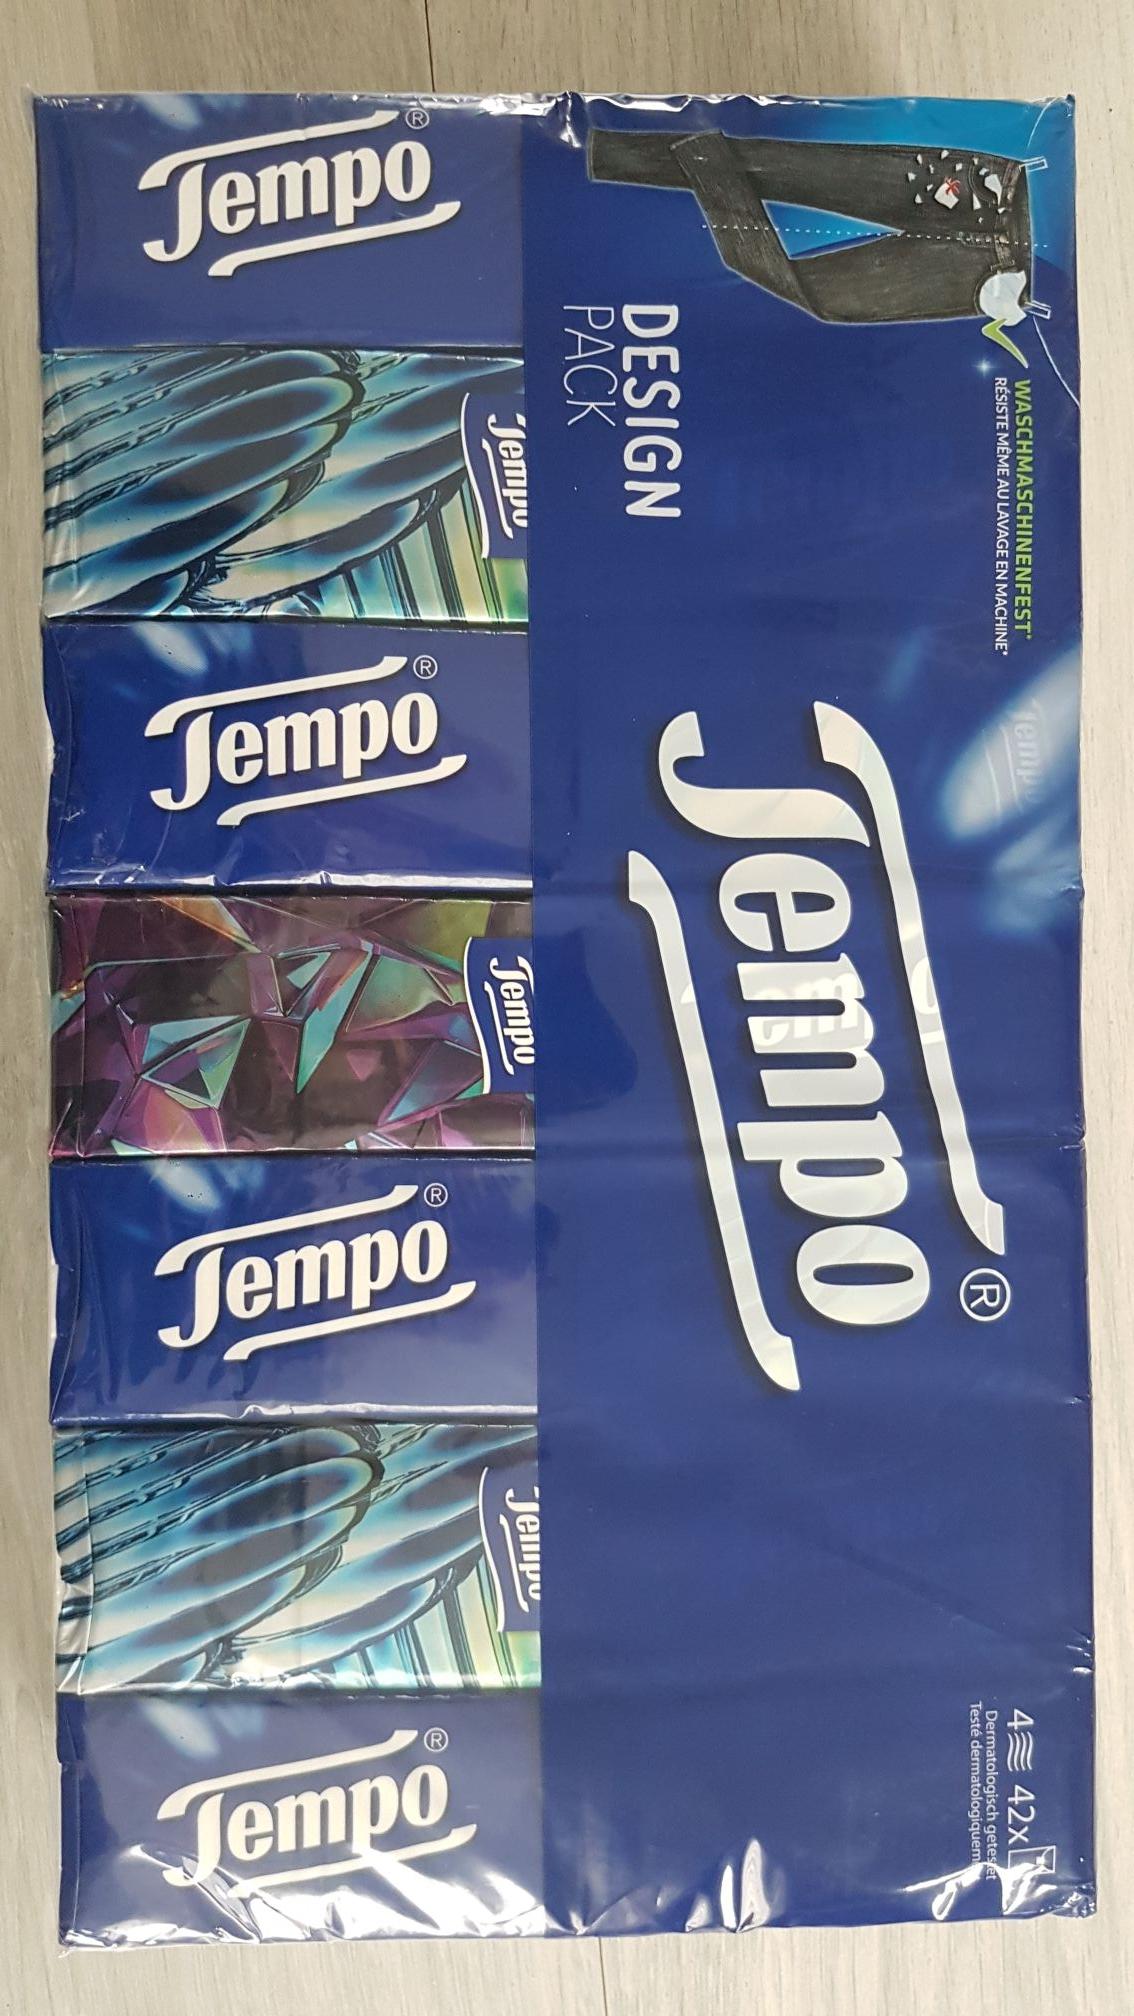 Grootverpakking wasmachine bestendige zakdoekjes van Tempo € 1,30 @ Etos Zwolle centrum